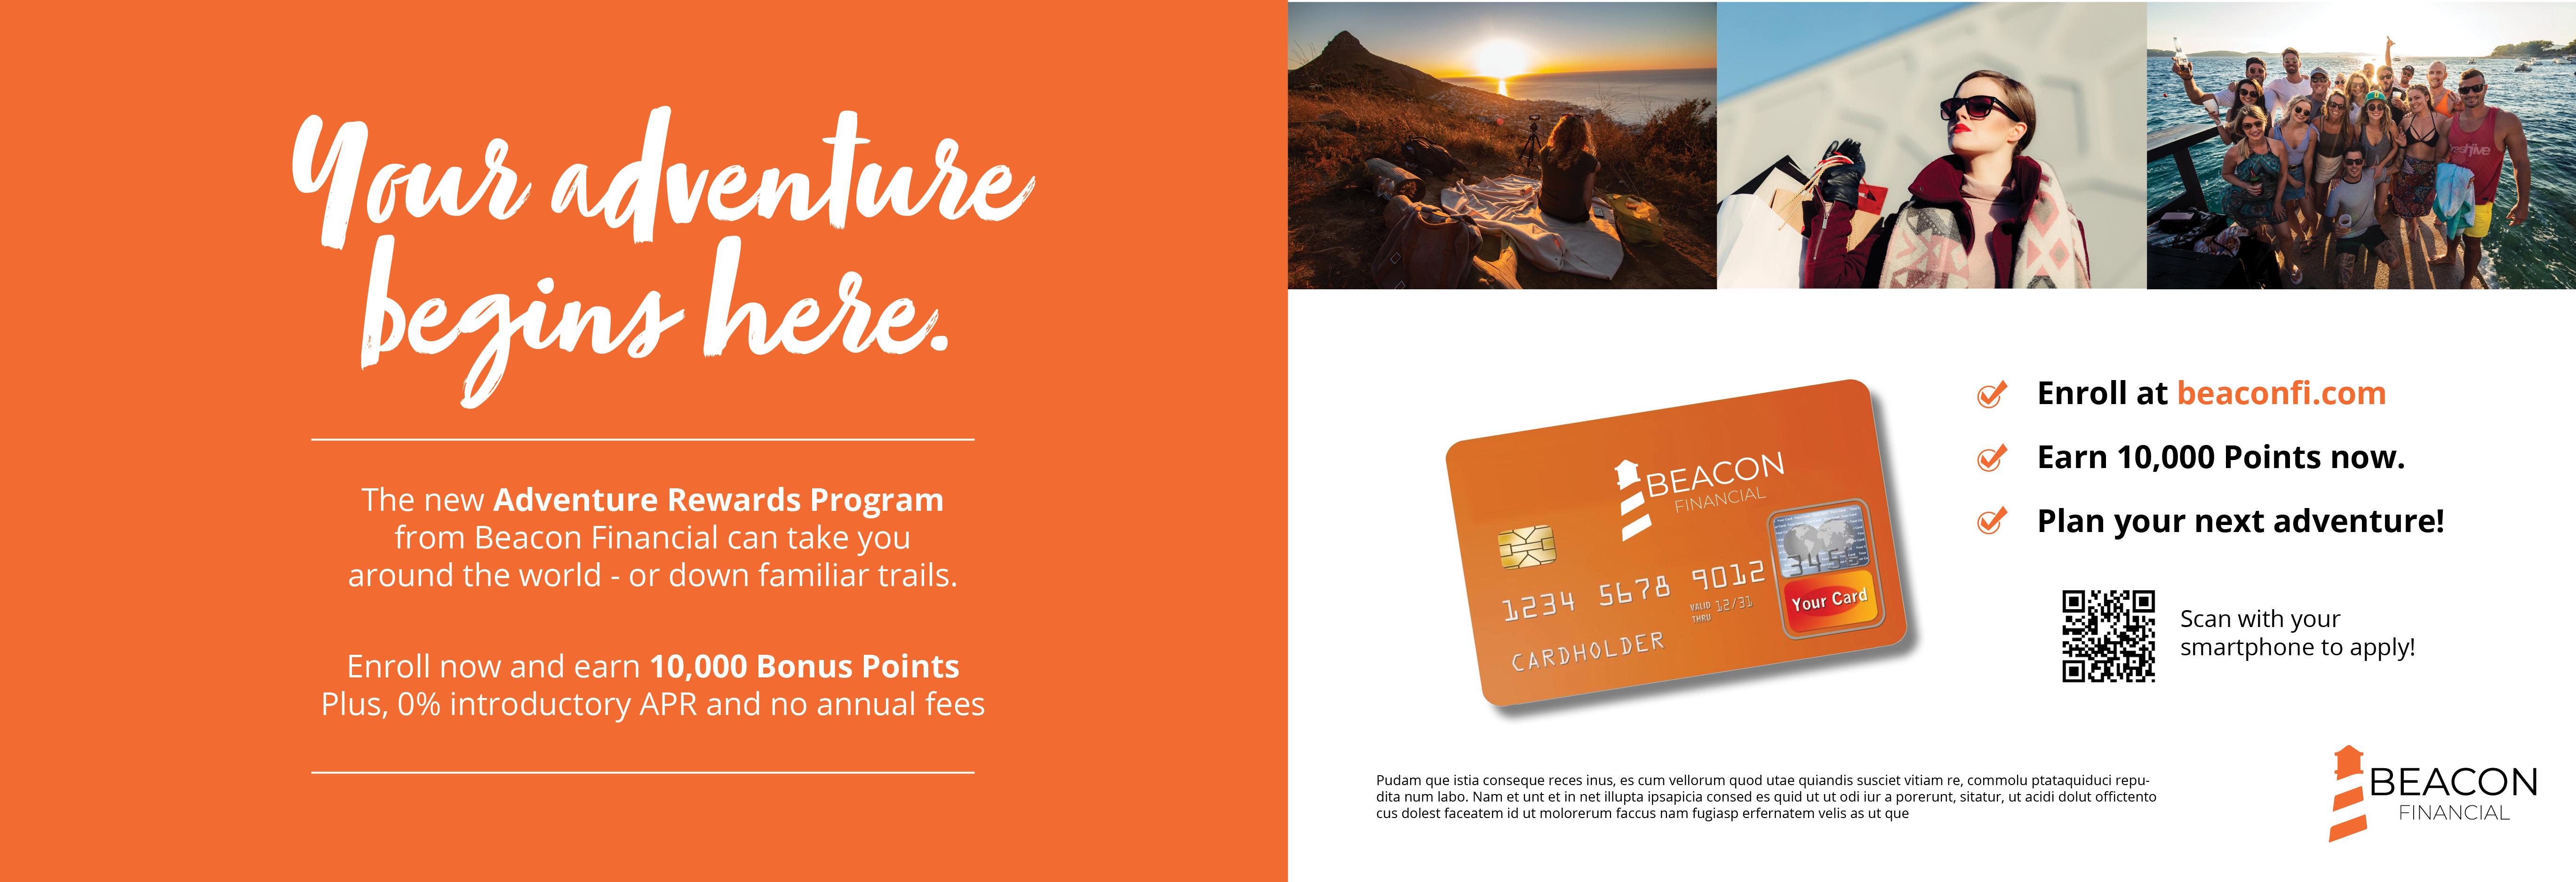 Reward Card Acquisition Self Mailer